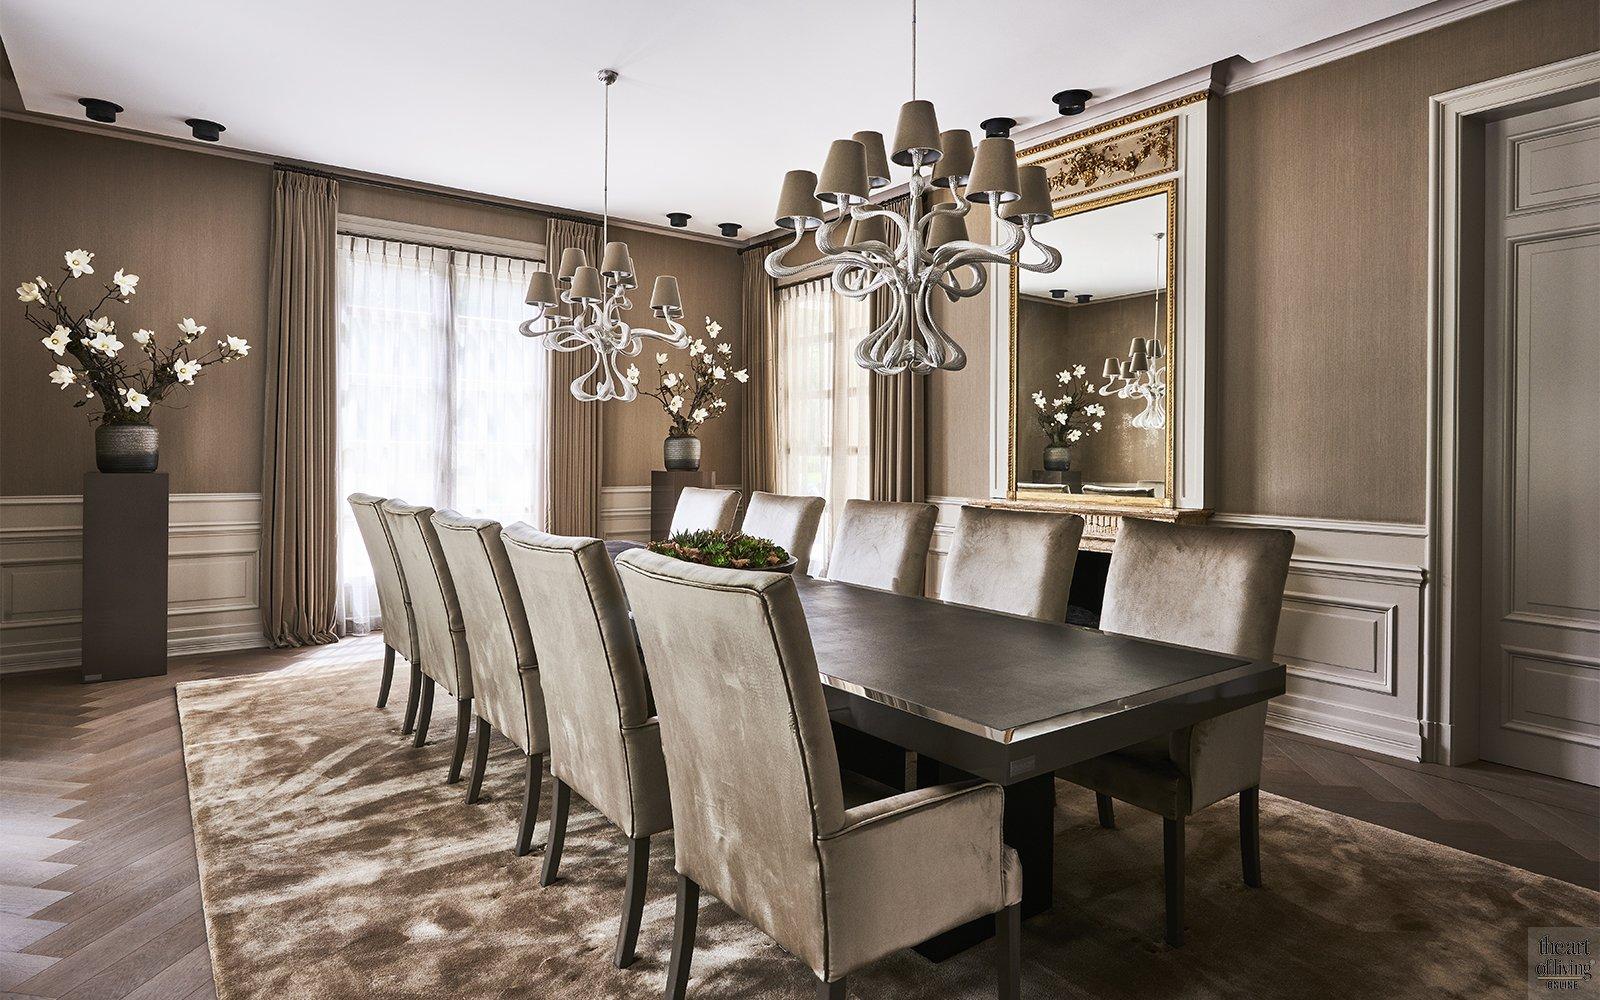 Exclusief interieur, Eric Kuster, Metropolitan, Eric Kuster Metropolitan Luxury, Luxe, Wellness, Villa